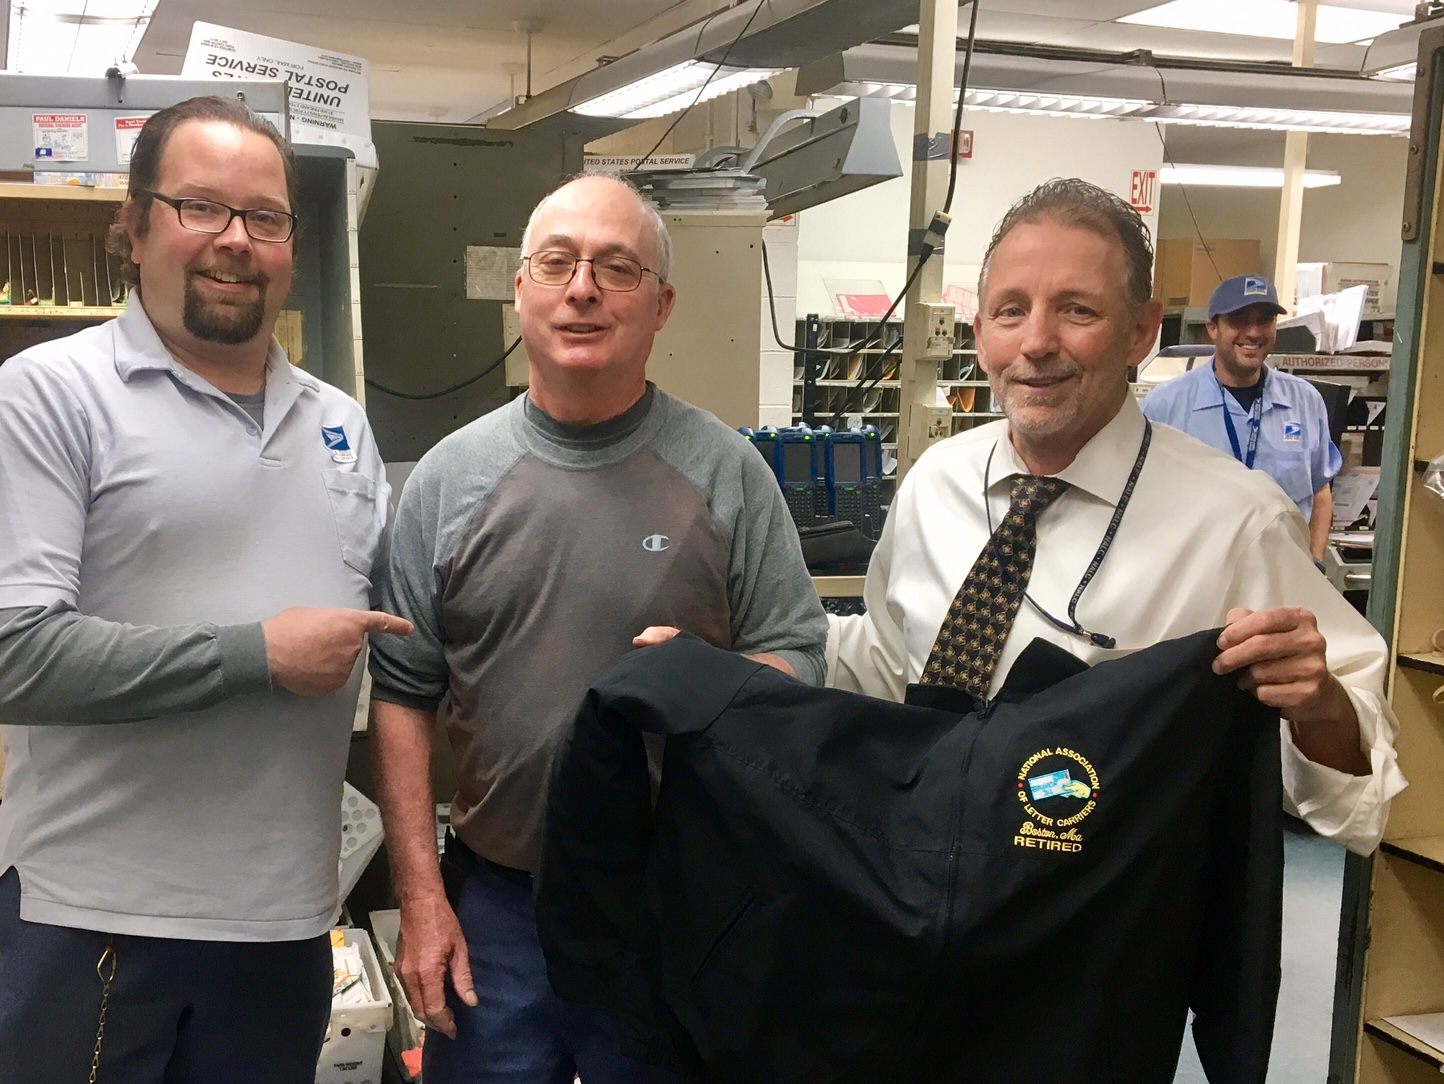 Auburndale Steward Tom Kierstead and President Michael Yerkes congratulate Bob Fadden on his last day following more than 30 years of service